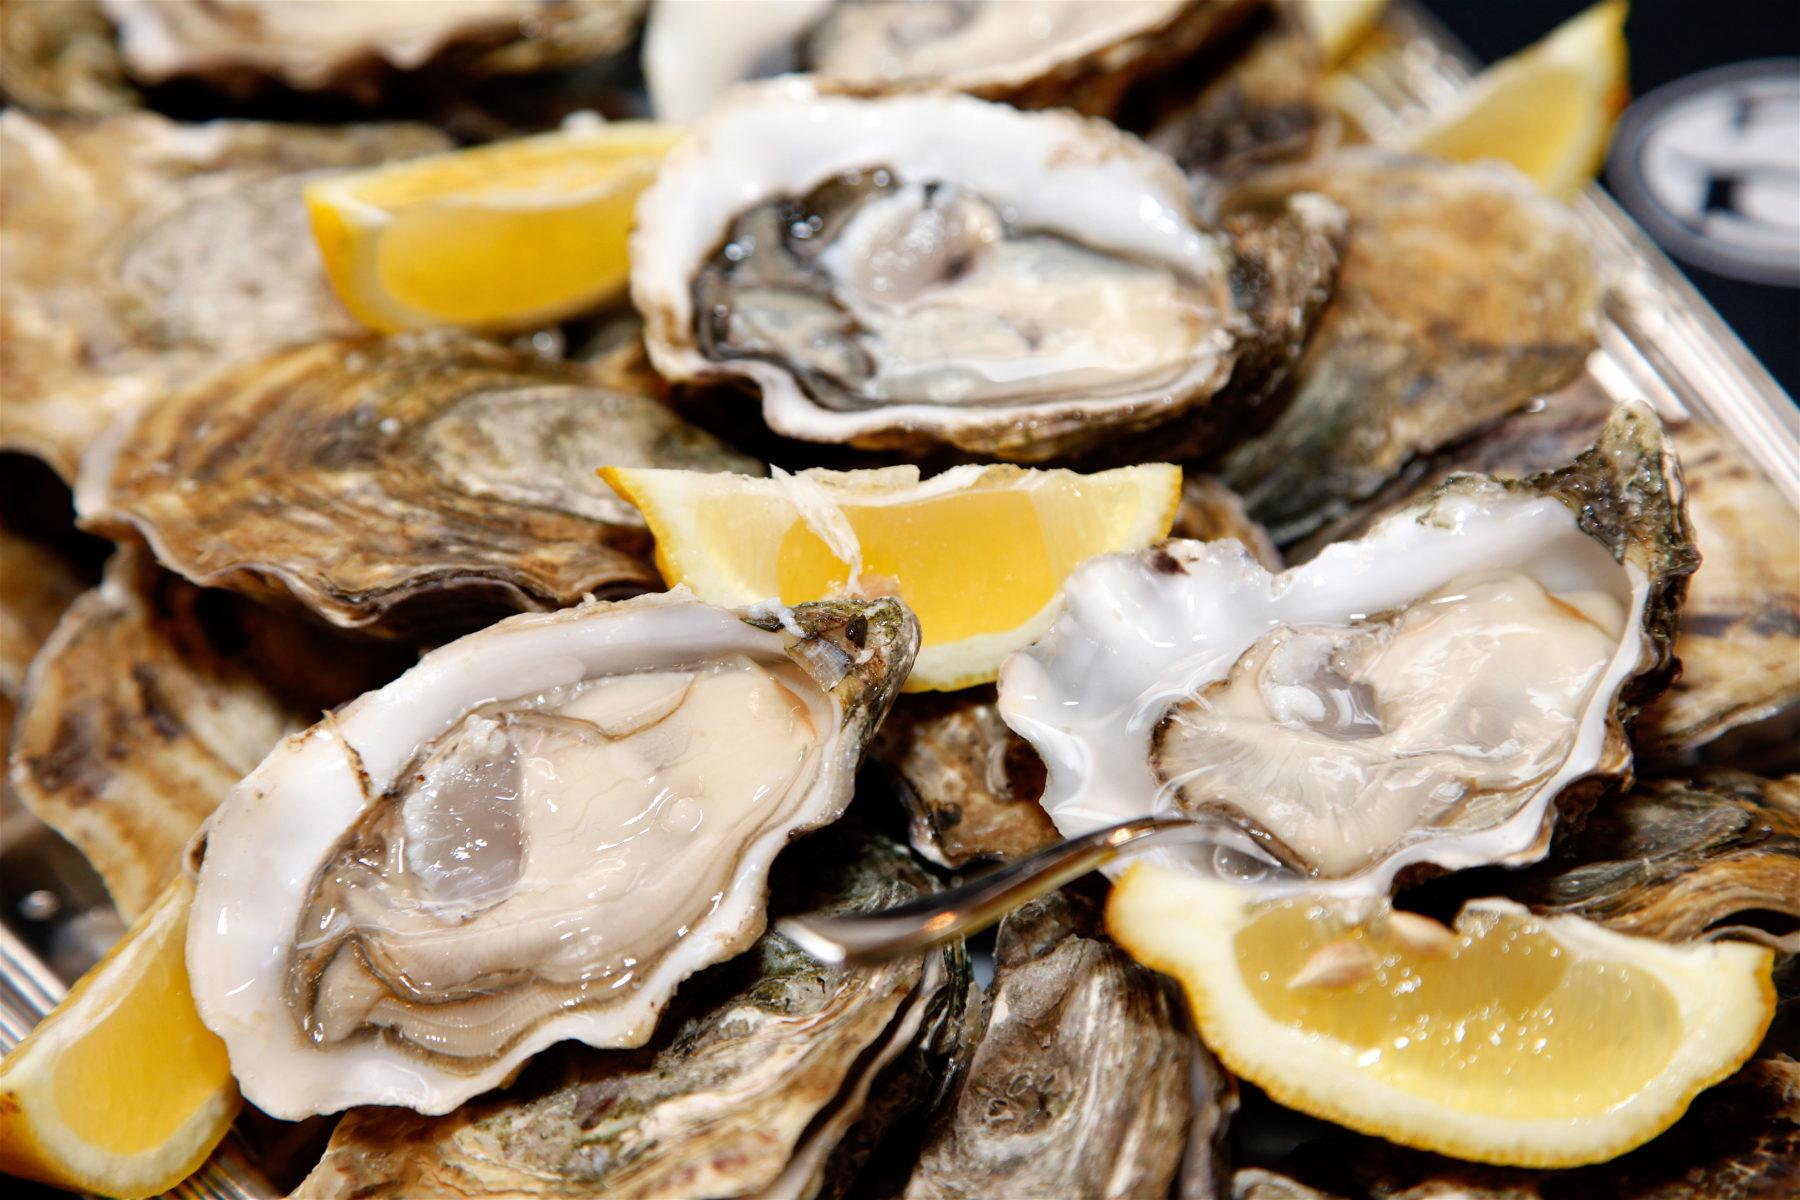 Hilton Head seafood - oysters